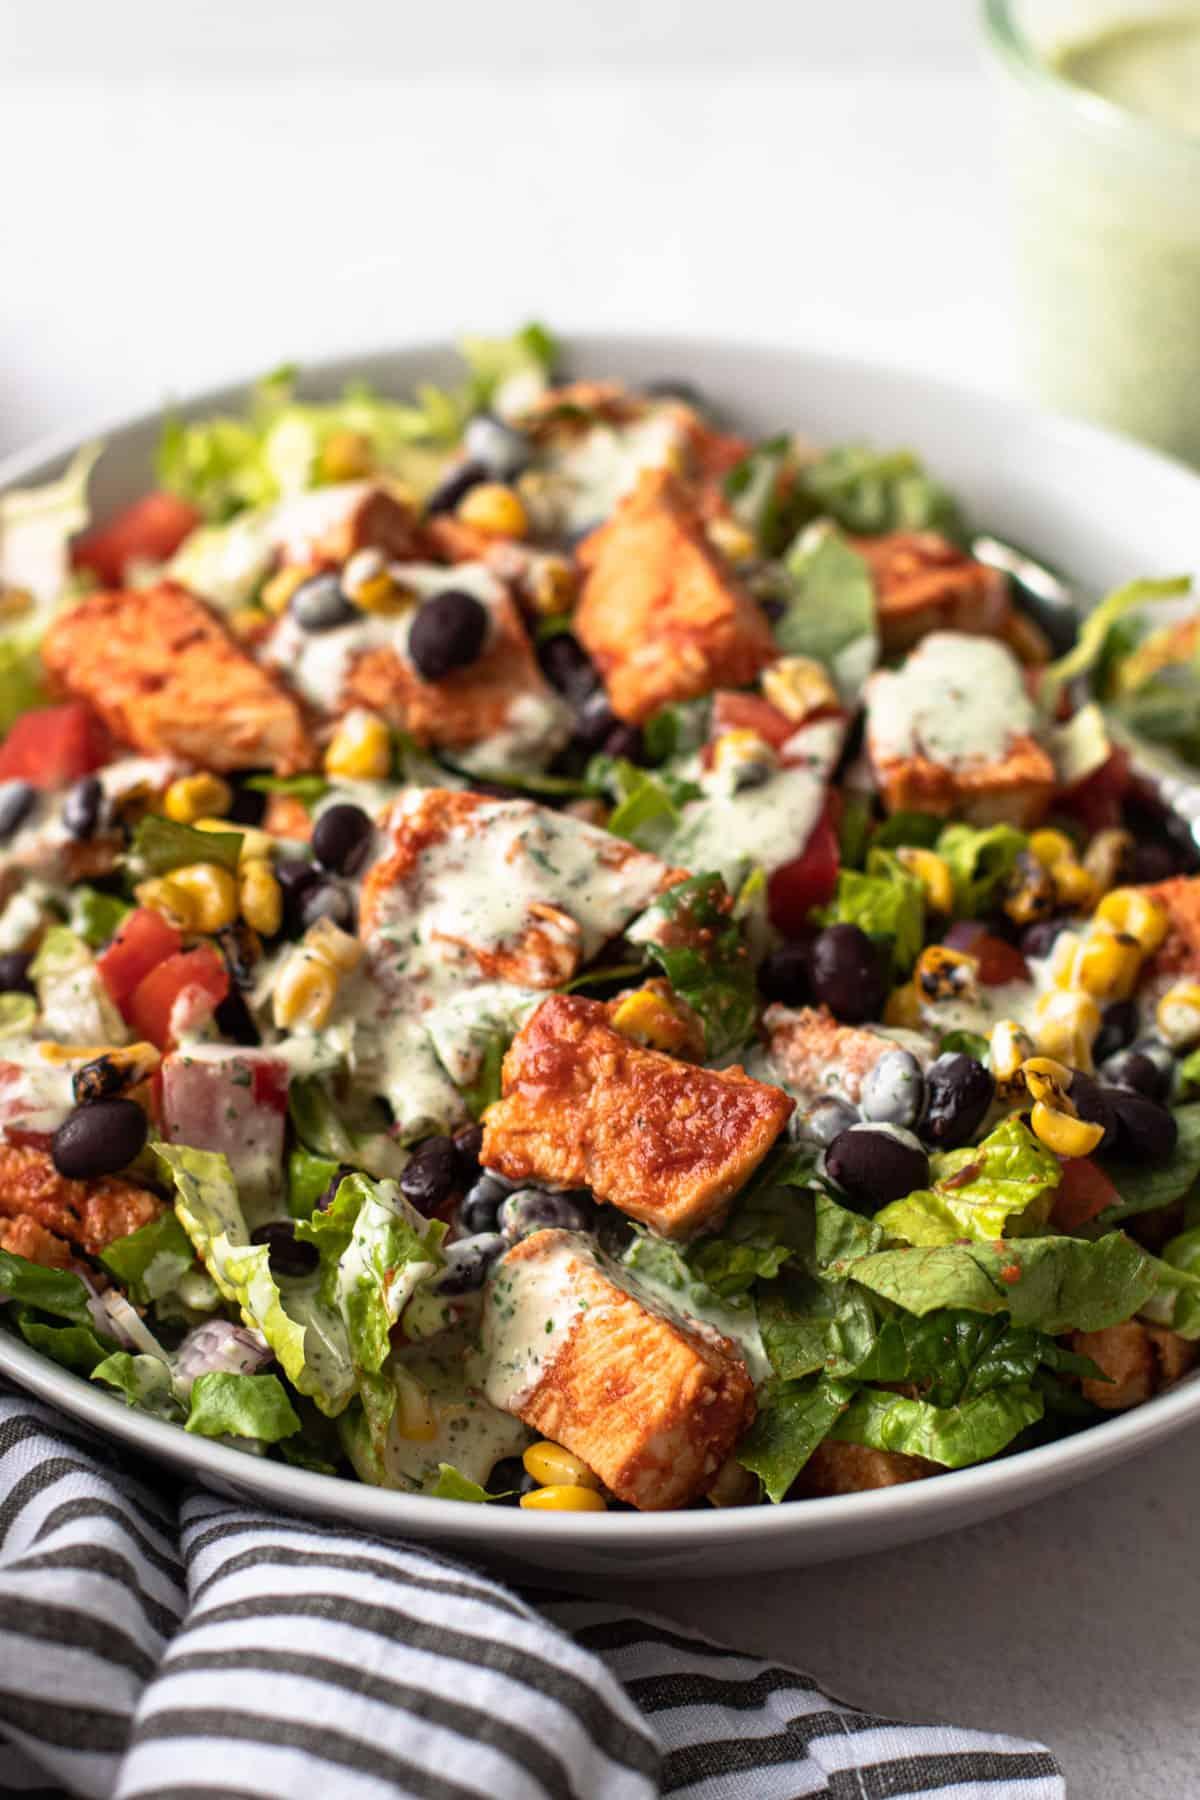 Dairy-free BBQ chicken salad in a bowl.